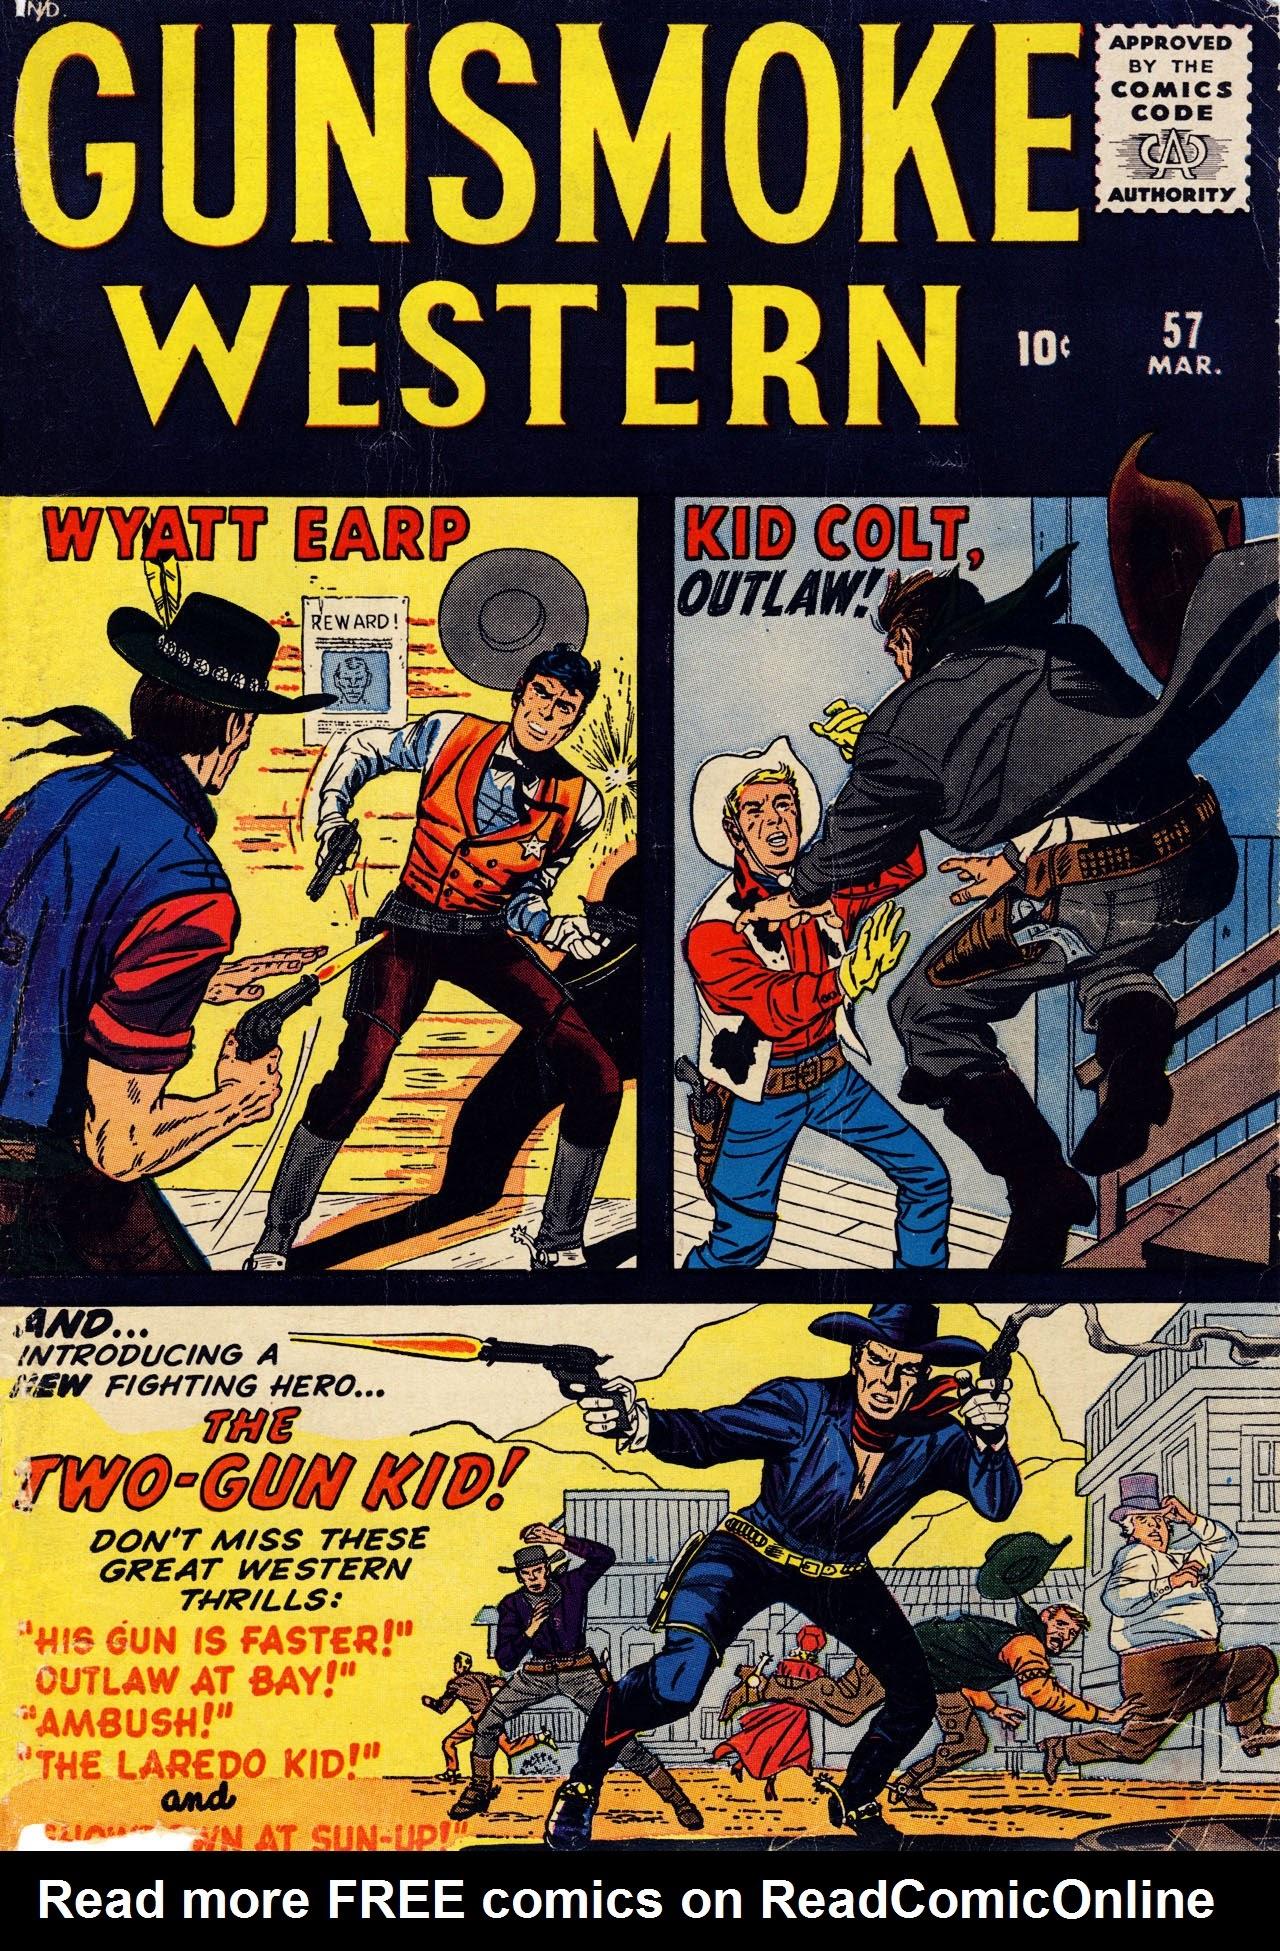 Gunsmoke Western 57 Page 1